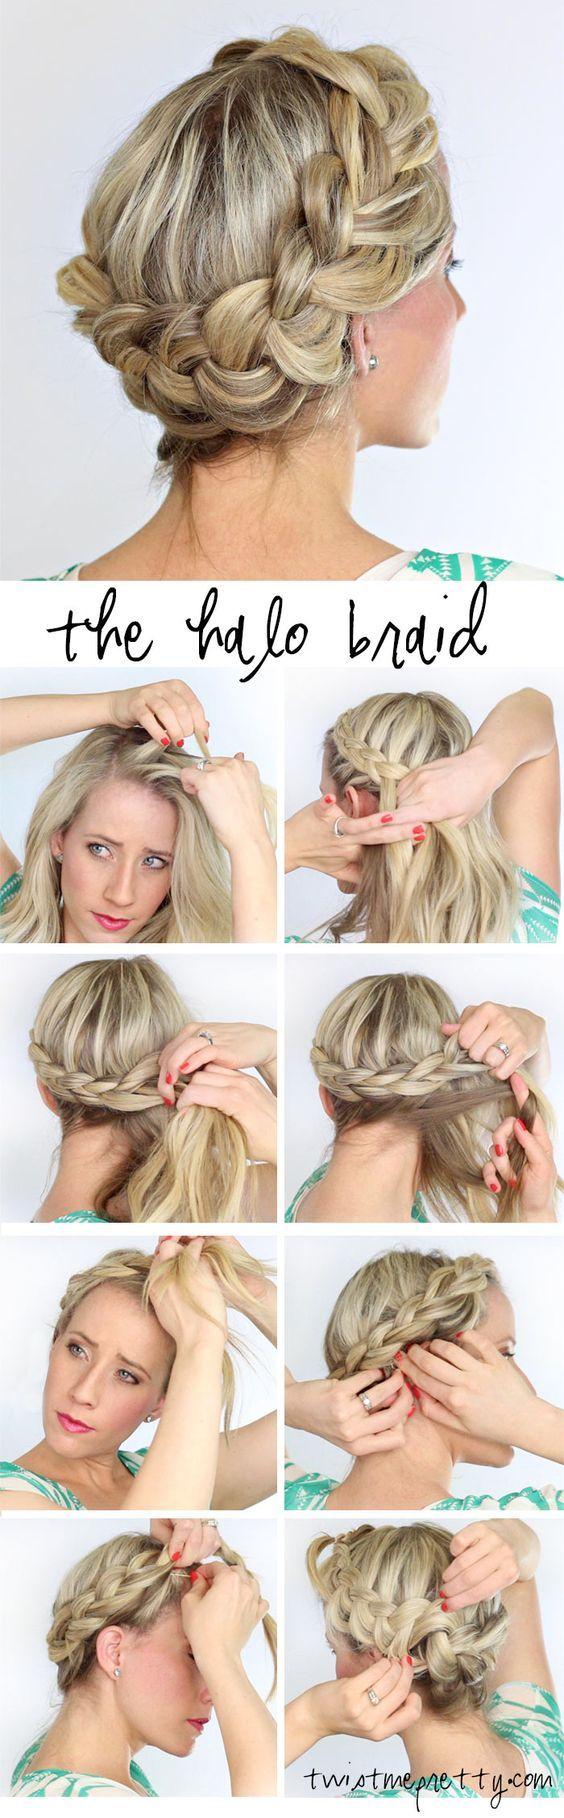 Groovy 1000 Ideas About Halo Braid On Pinterest Braids Goddess Braids Short Hairstyles For Black Women Fulllsitofus